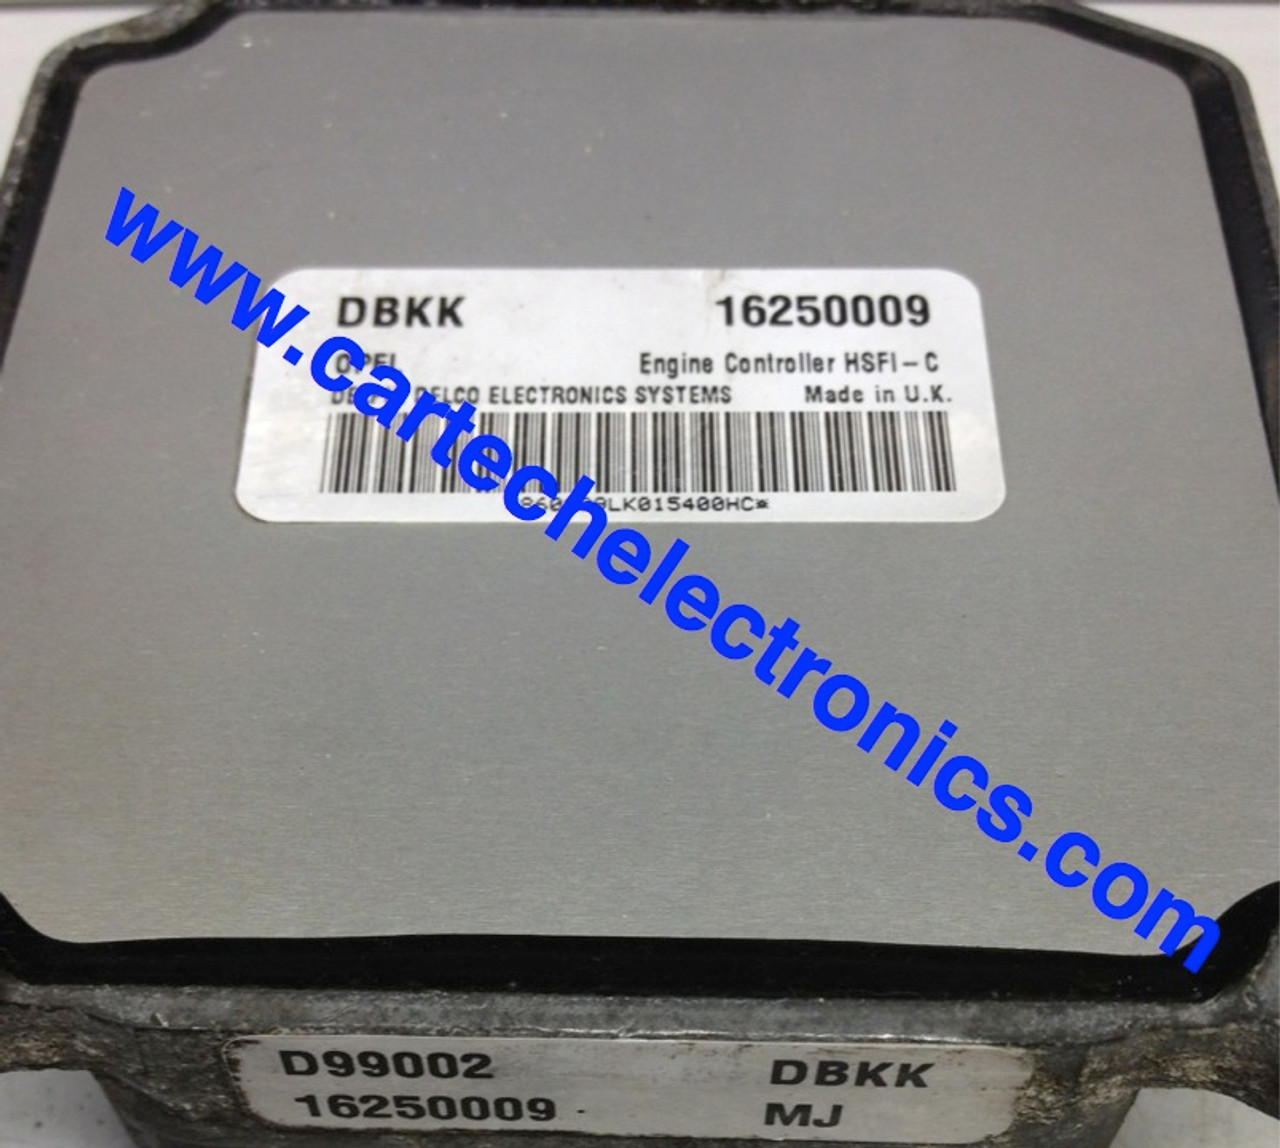 16250009 DBKK HSFI-C